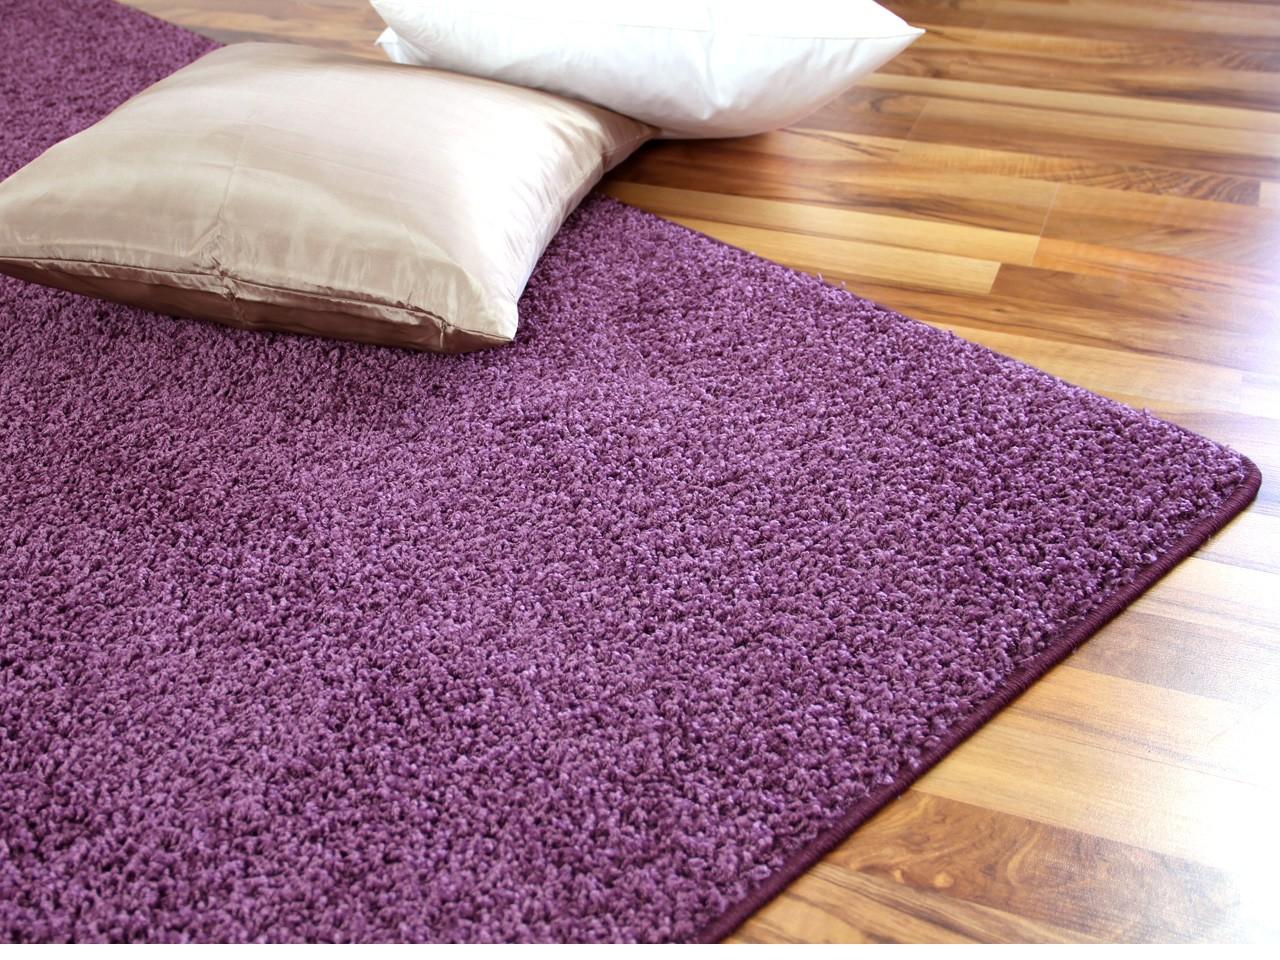 teppich grau flieder artownit for. Black Bedroom Furniture Sets. Home Design Ideas